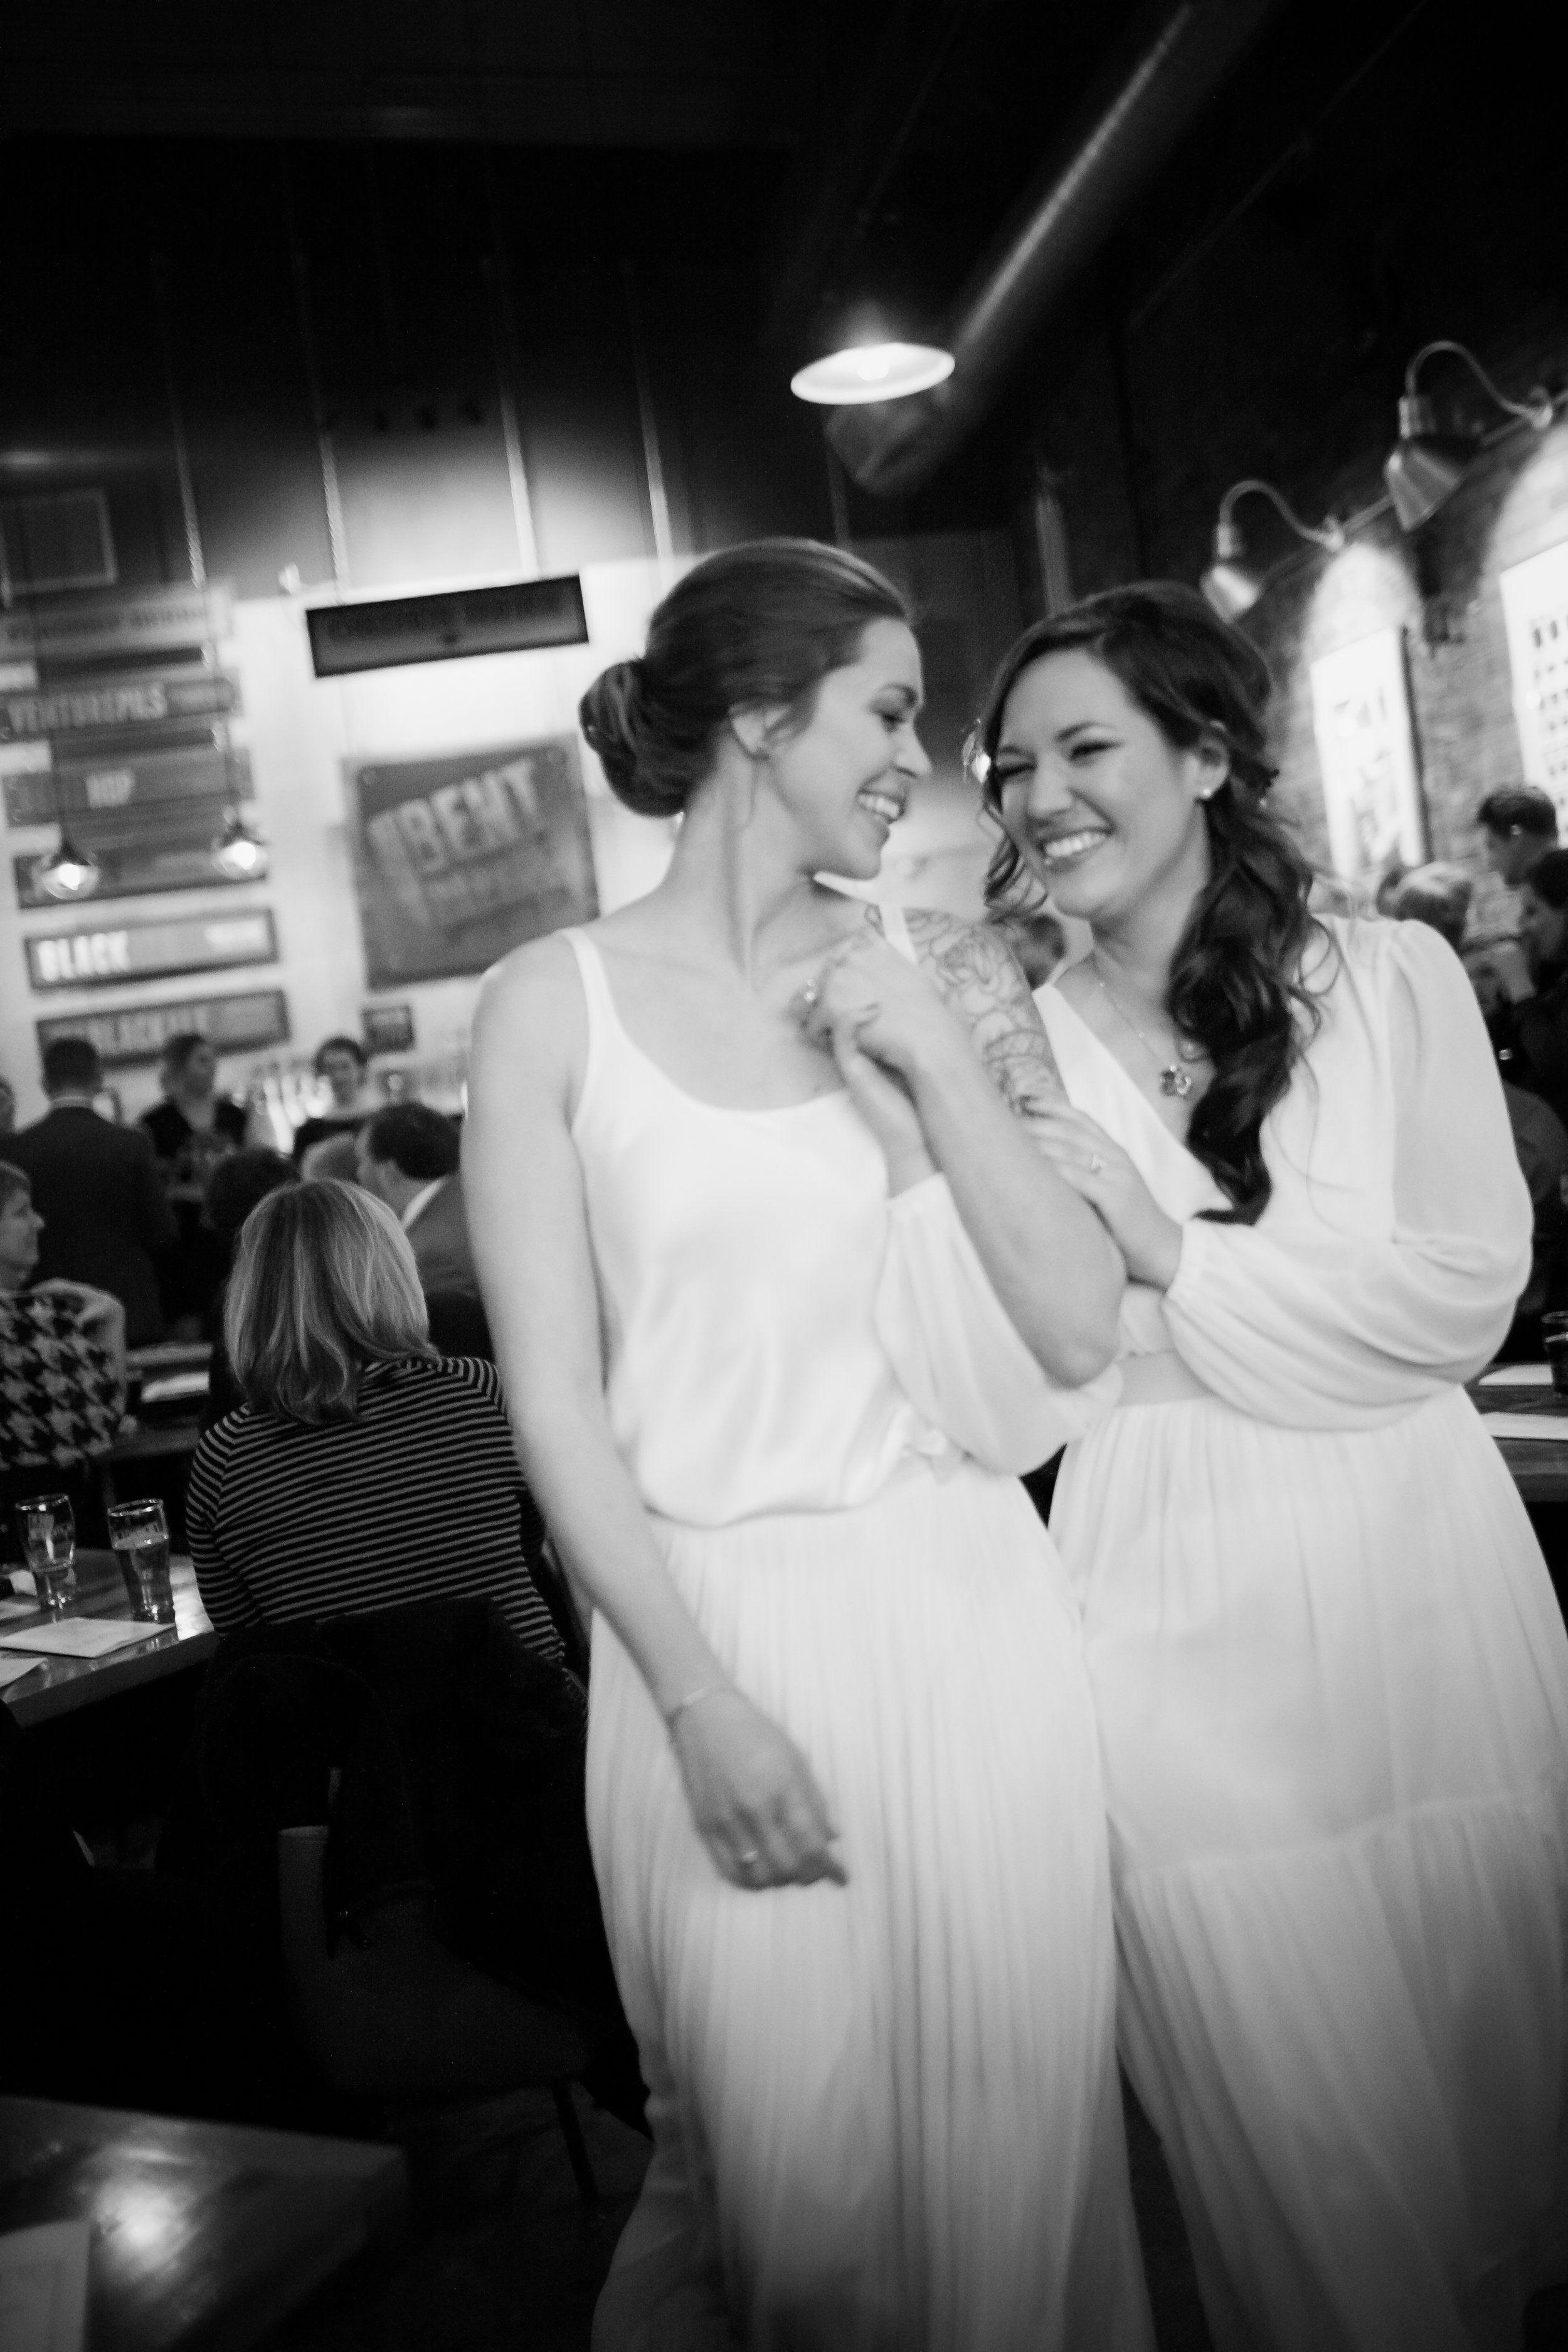 Wedding Makeup for Lesbian weddings. Clean beauty timeless wedding ...